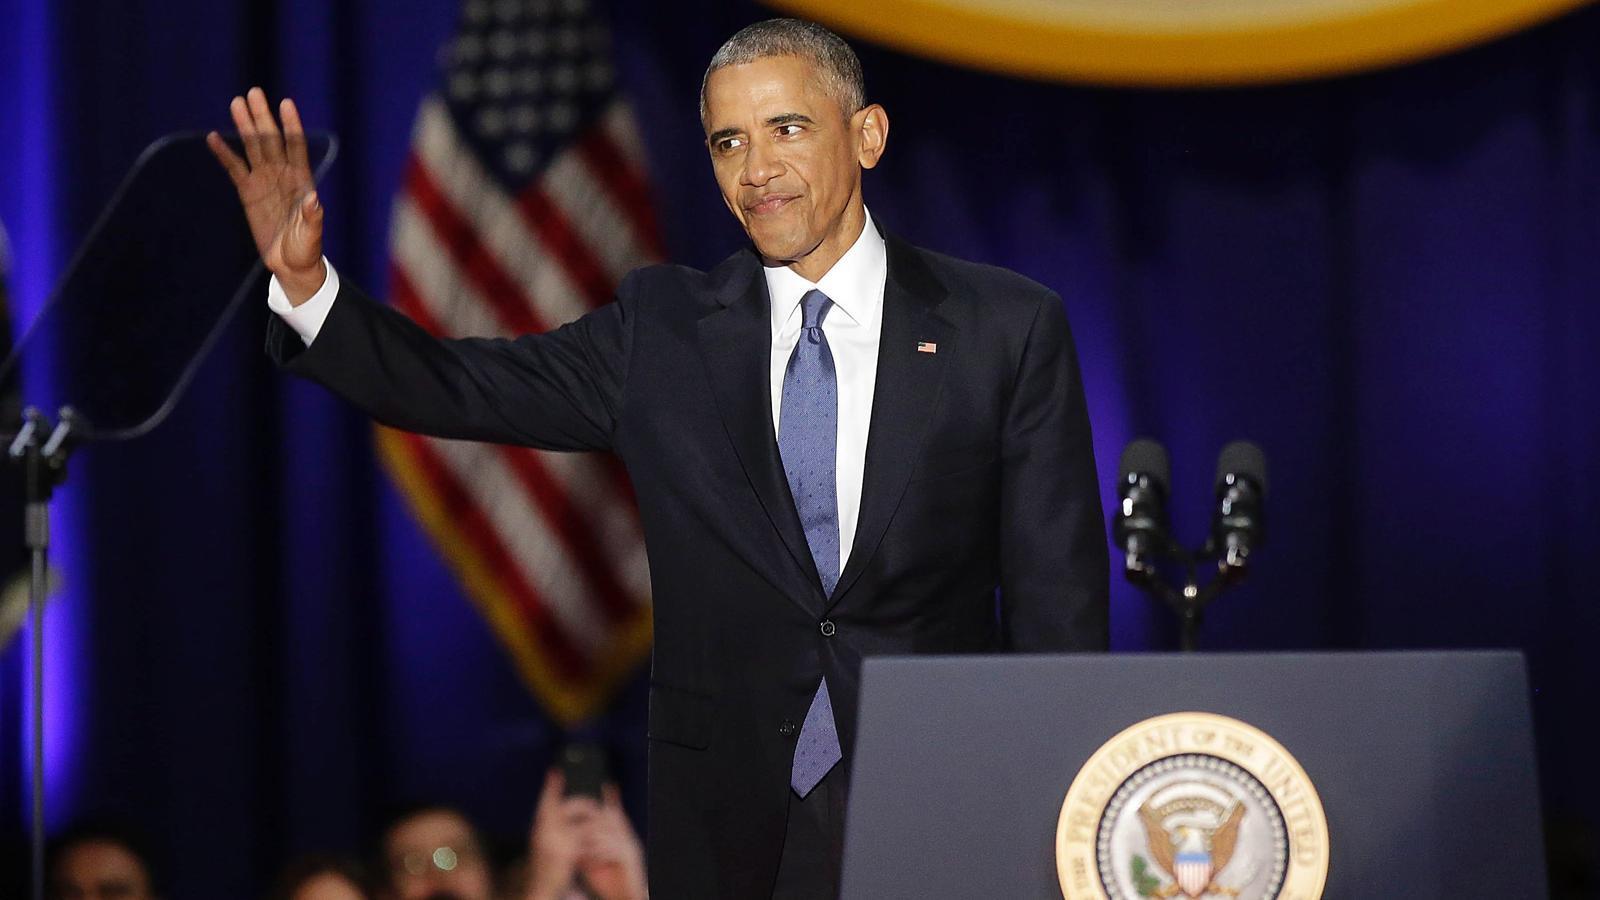 DES DE CASA - Página 12 Obama-discurs-daquesta-matinada-Chicago_1721837888_36491835_377x224